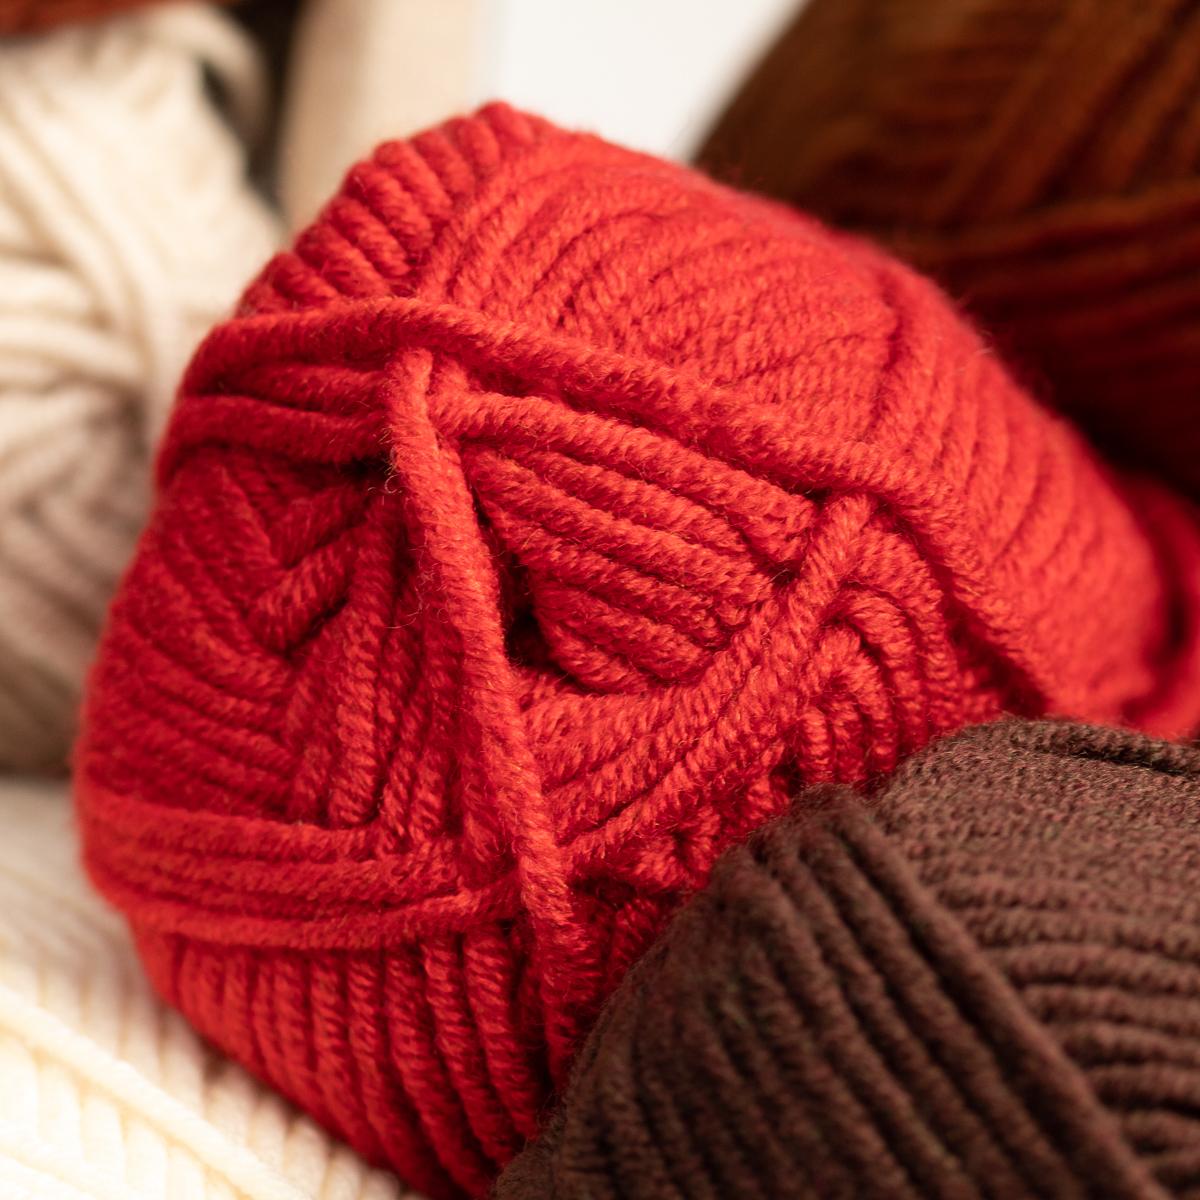 3pk-Lion-Brand-Woolspun-Acrylic-amp-Wool-Yarn-Bulky-5-Knit-Crocheting-Skeins-Soft thumbnail 106